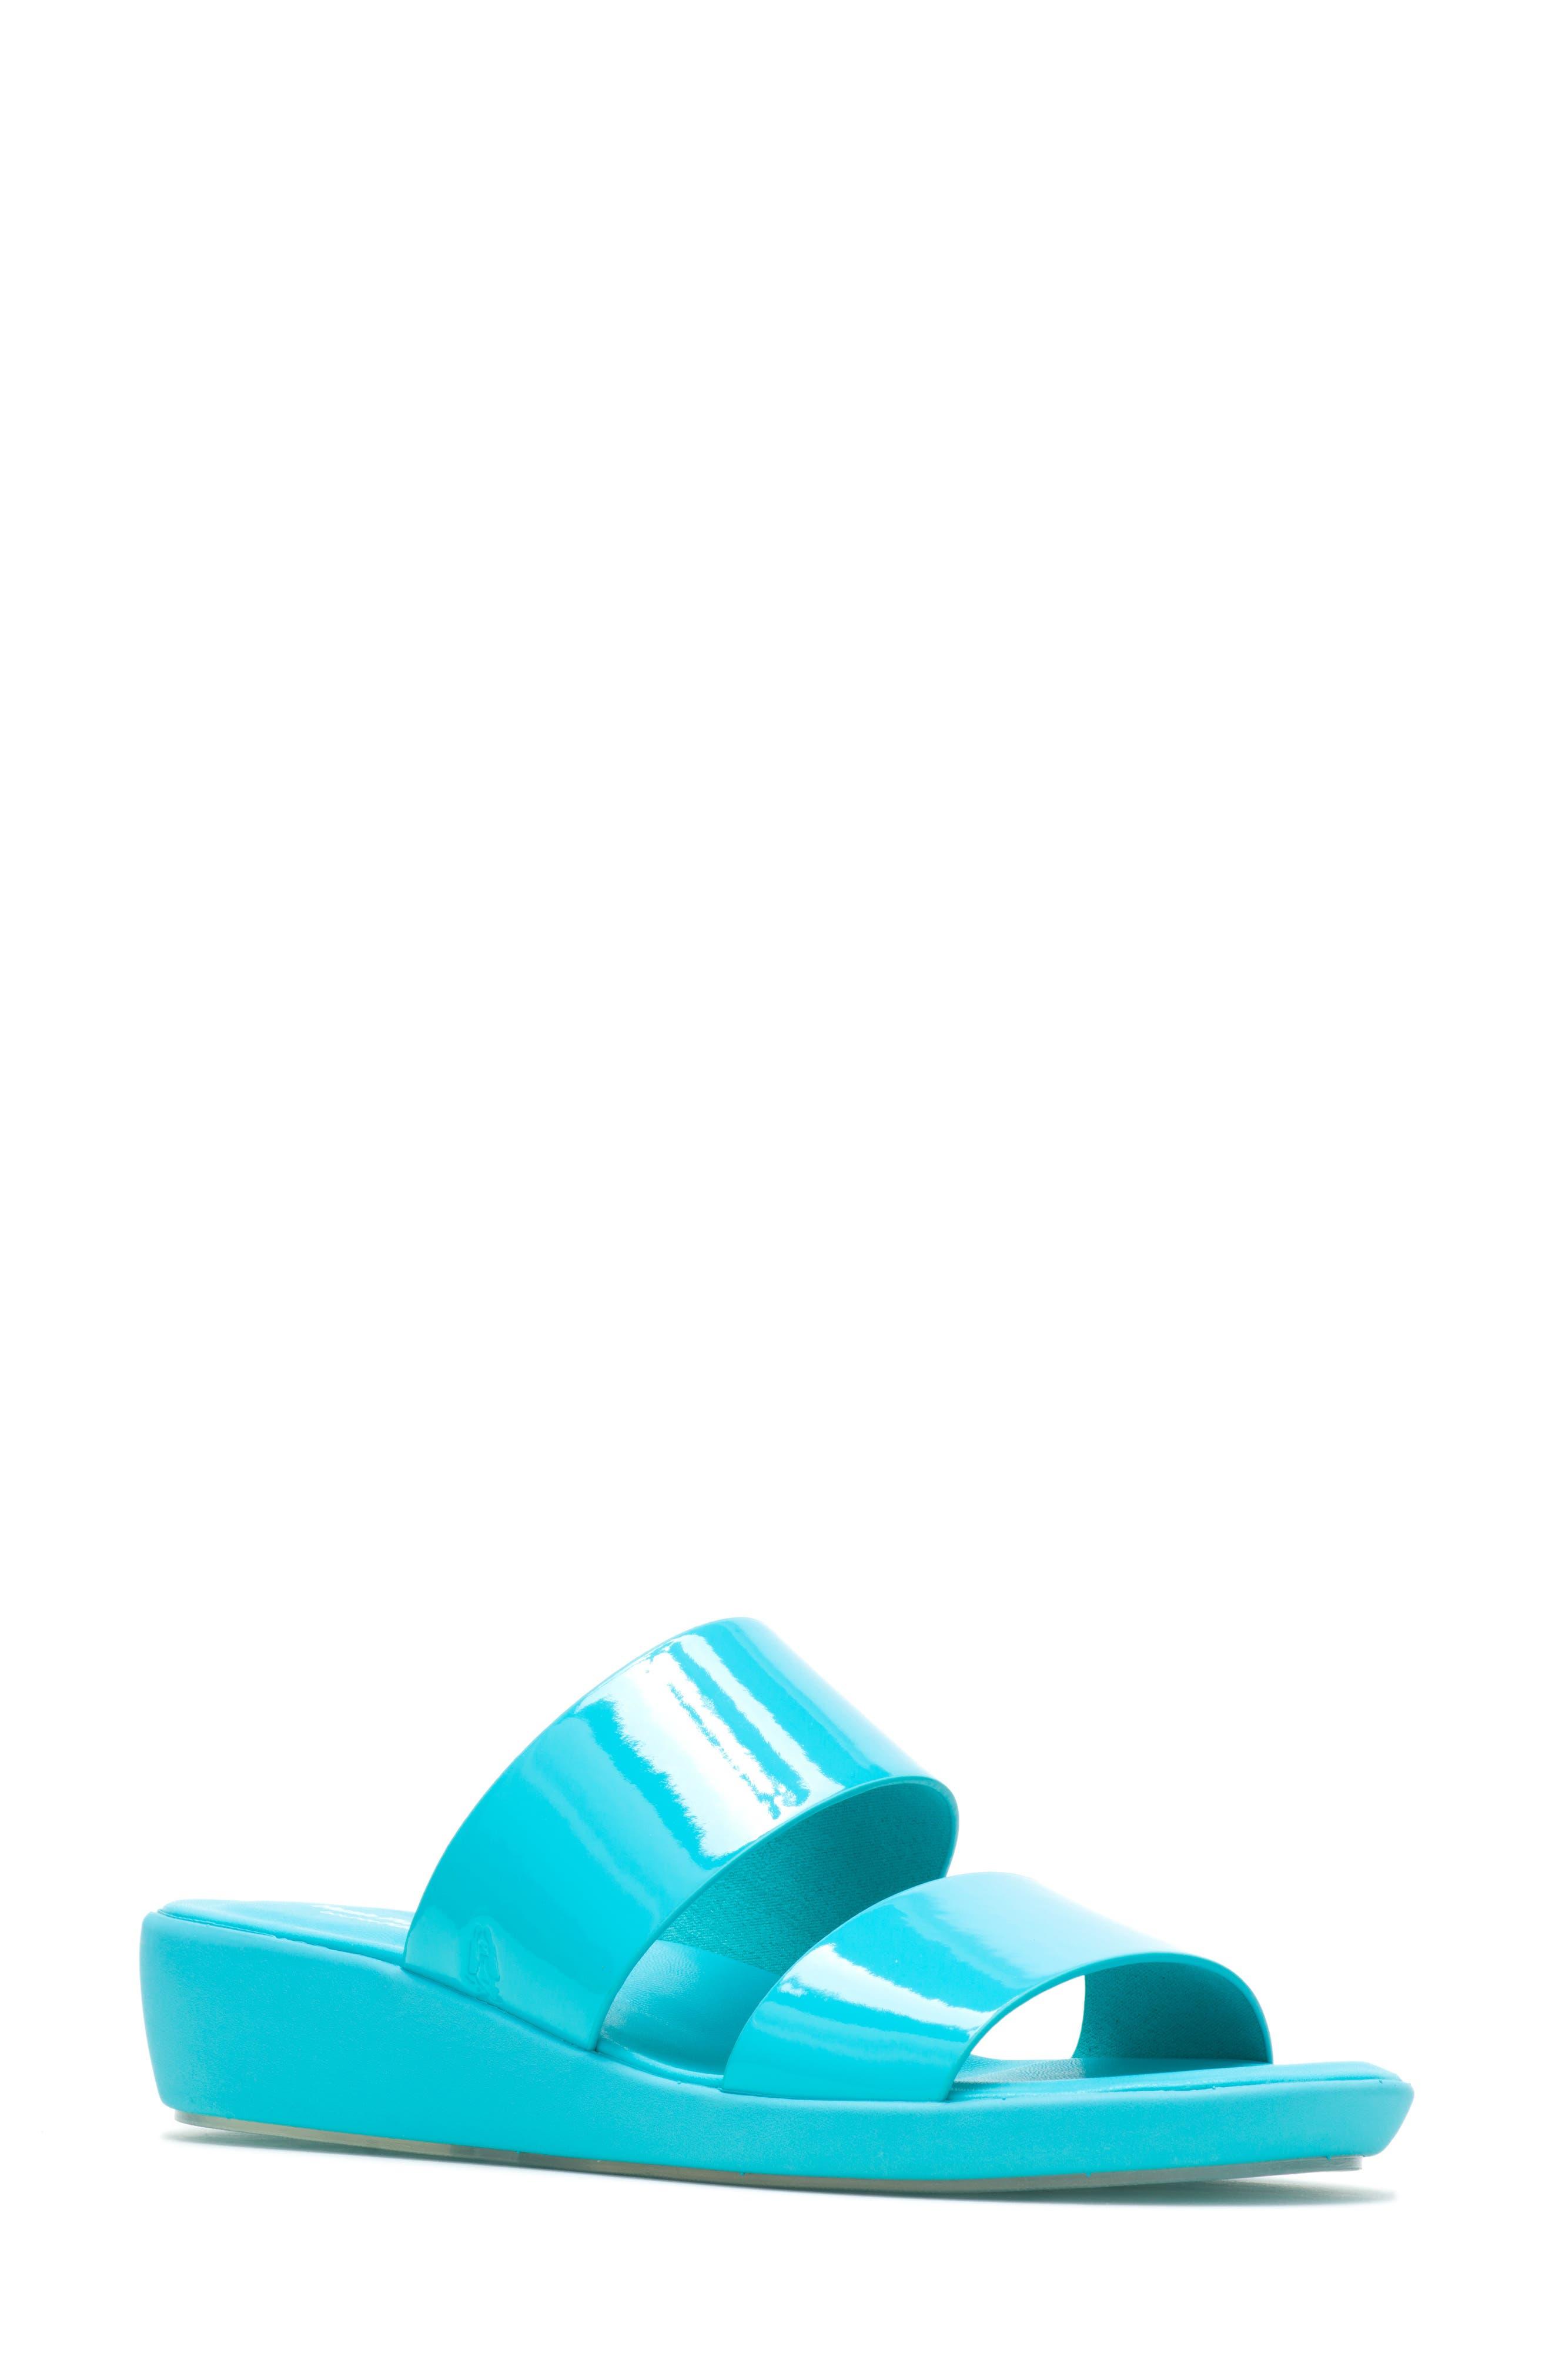 Brite Jells Slide Sandal